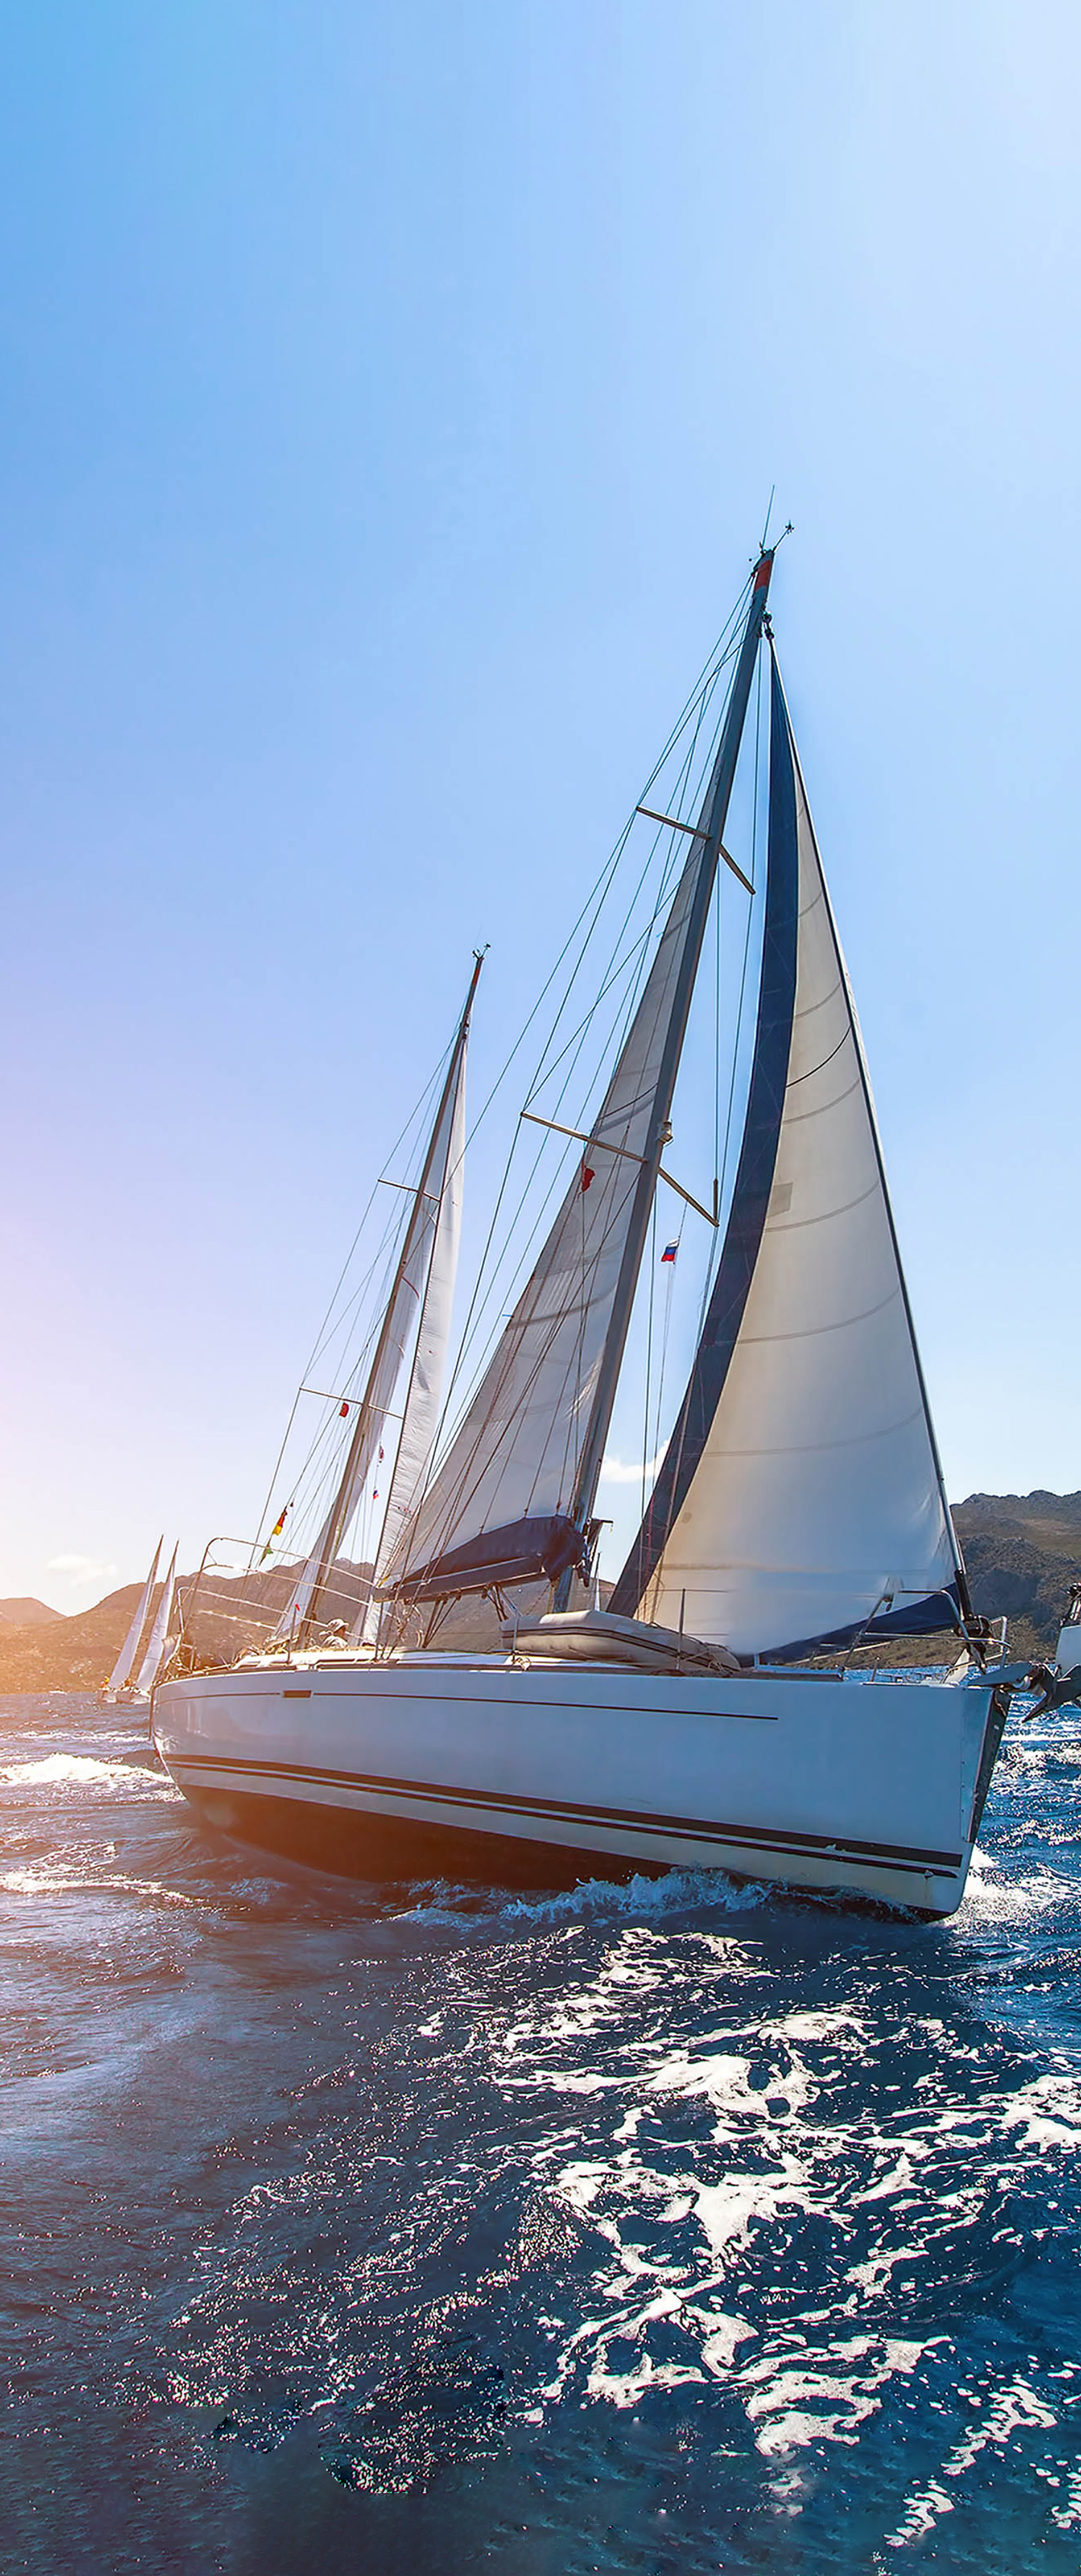 Luxury yachts Sailing regatta